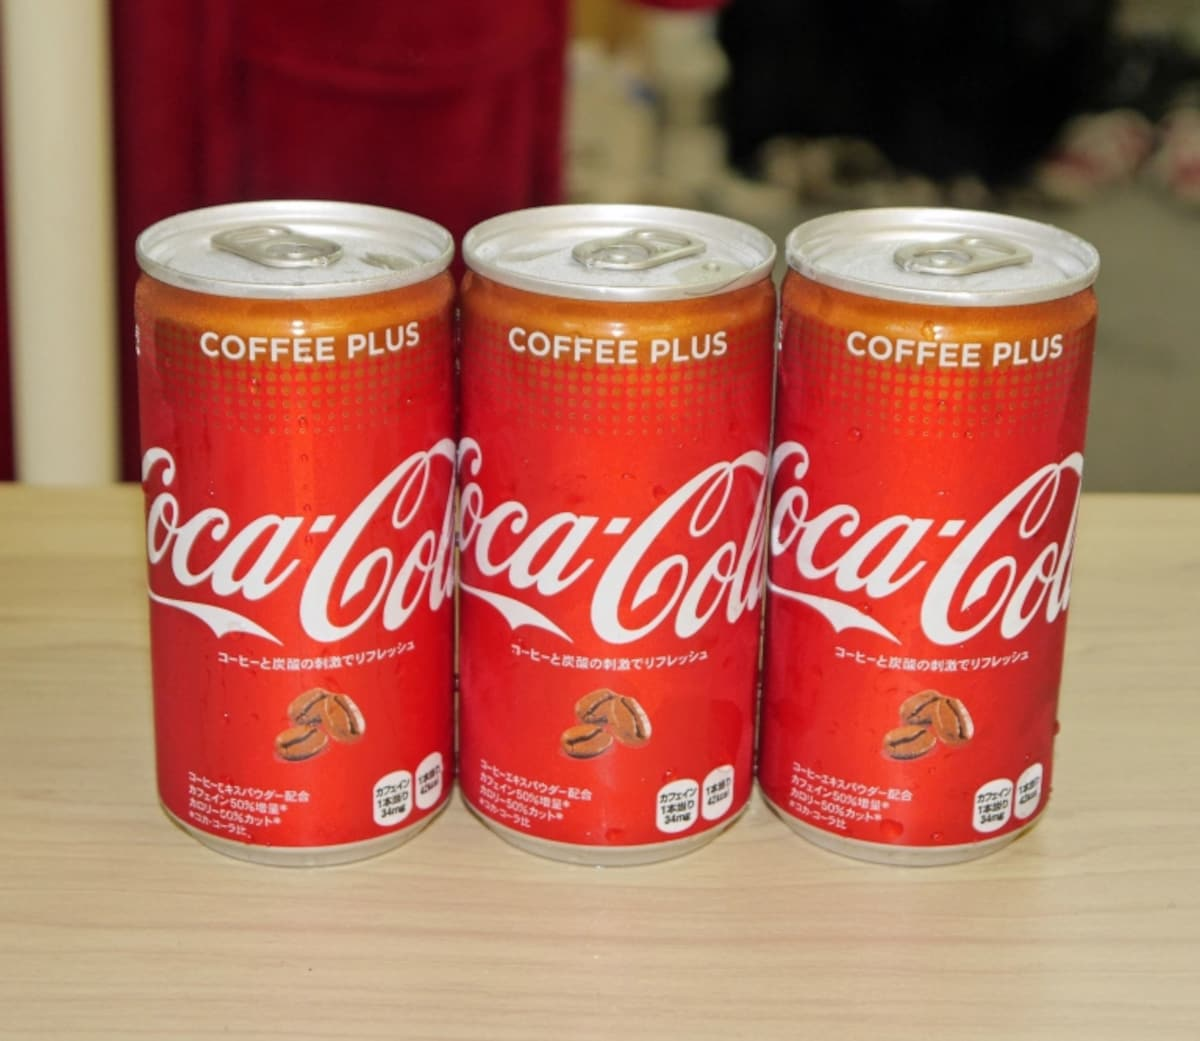 Coca-Cola Plus Coffee 2 Empty Cans Cambodia Khmer open bottom  2018